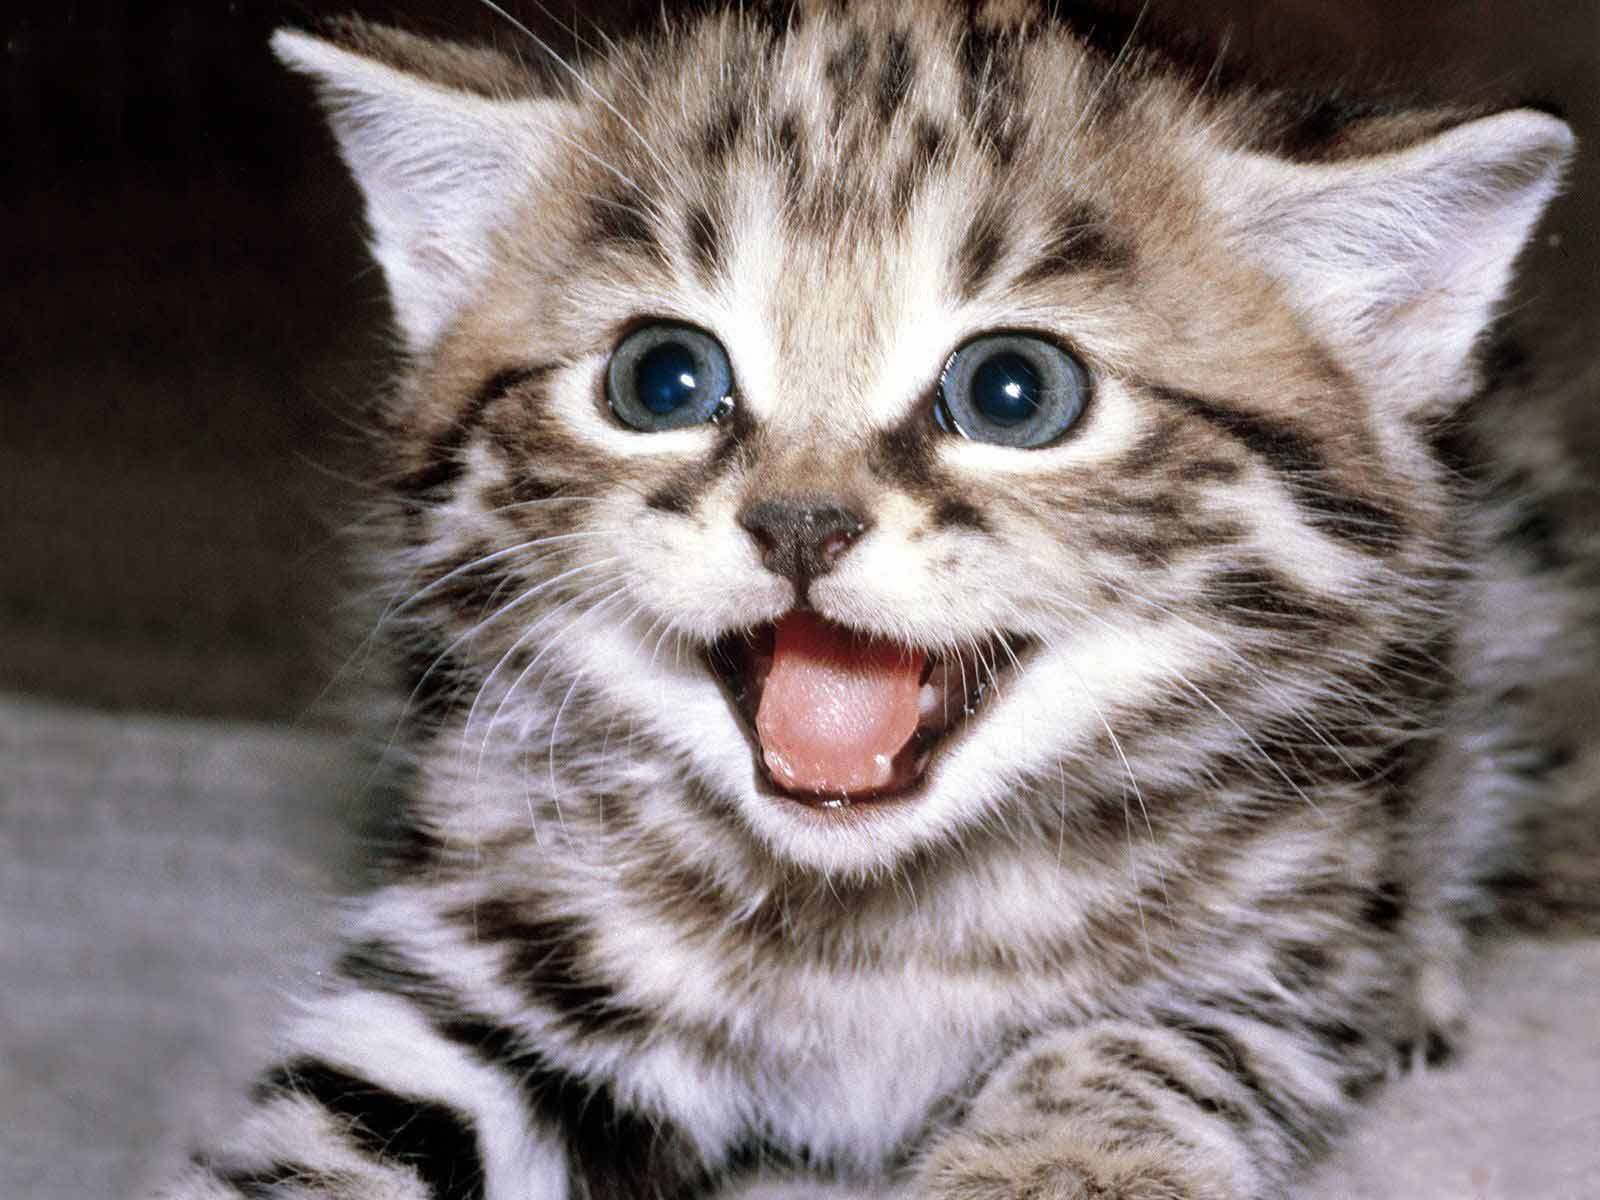 http://tailsmagazines.files.wordpress.com/2009/04/kitten.jpg